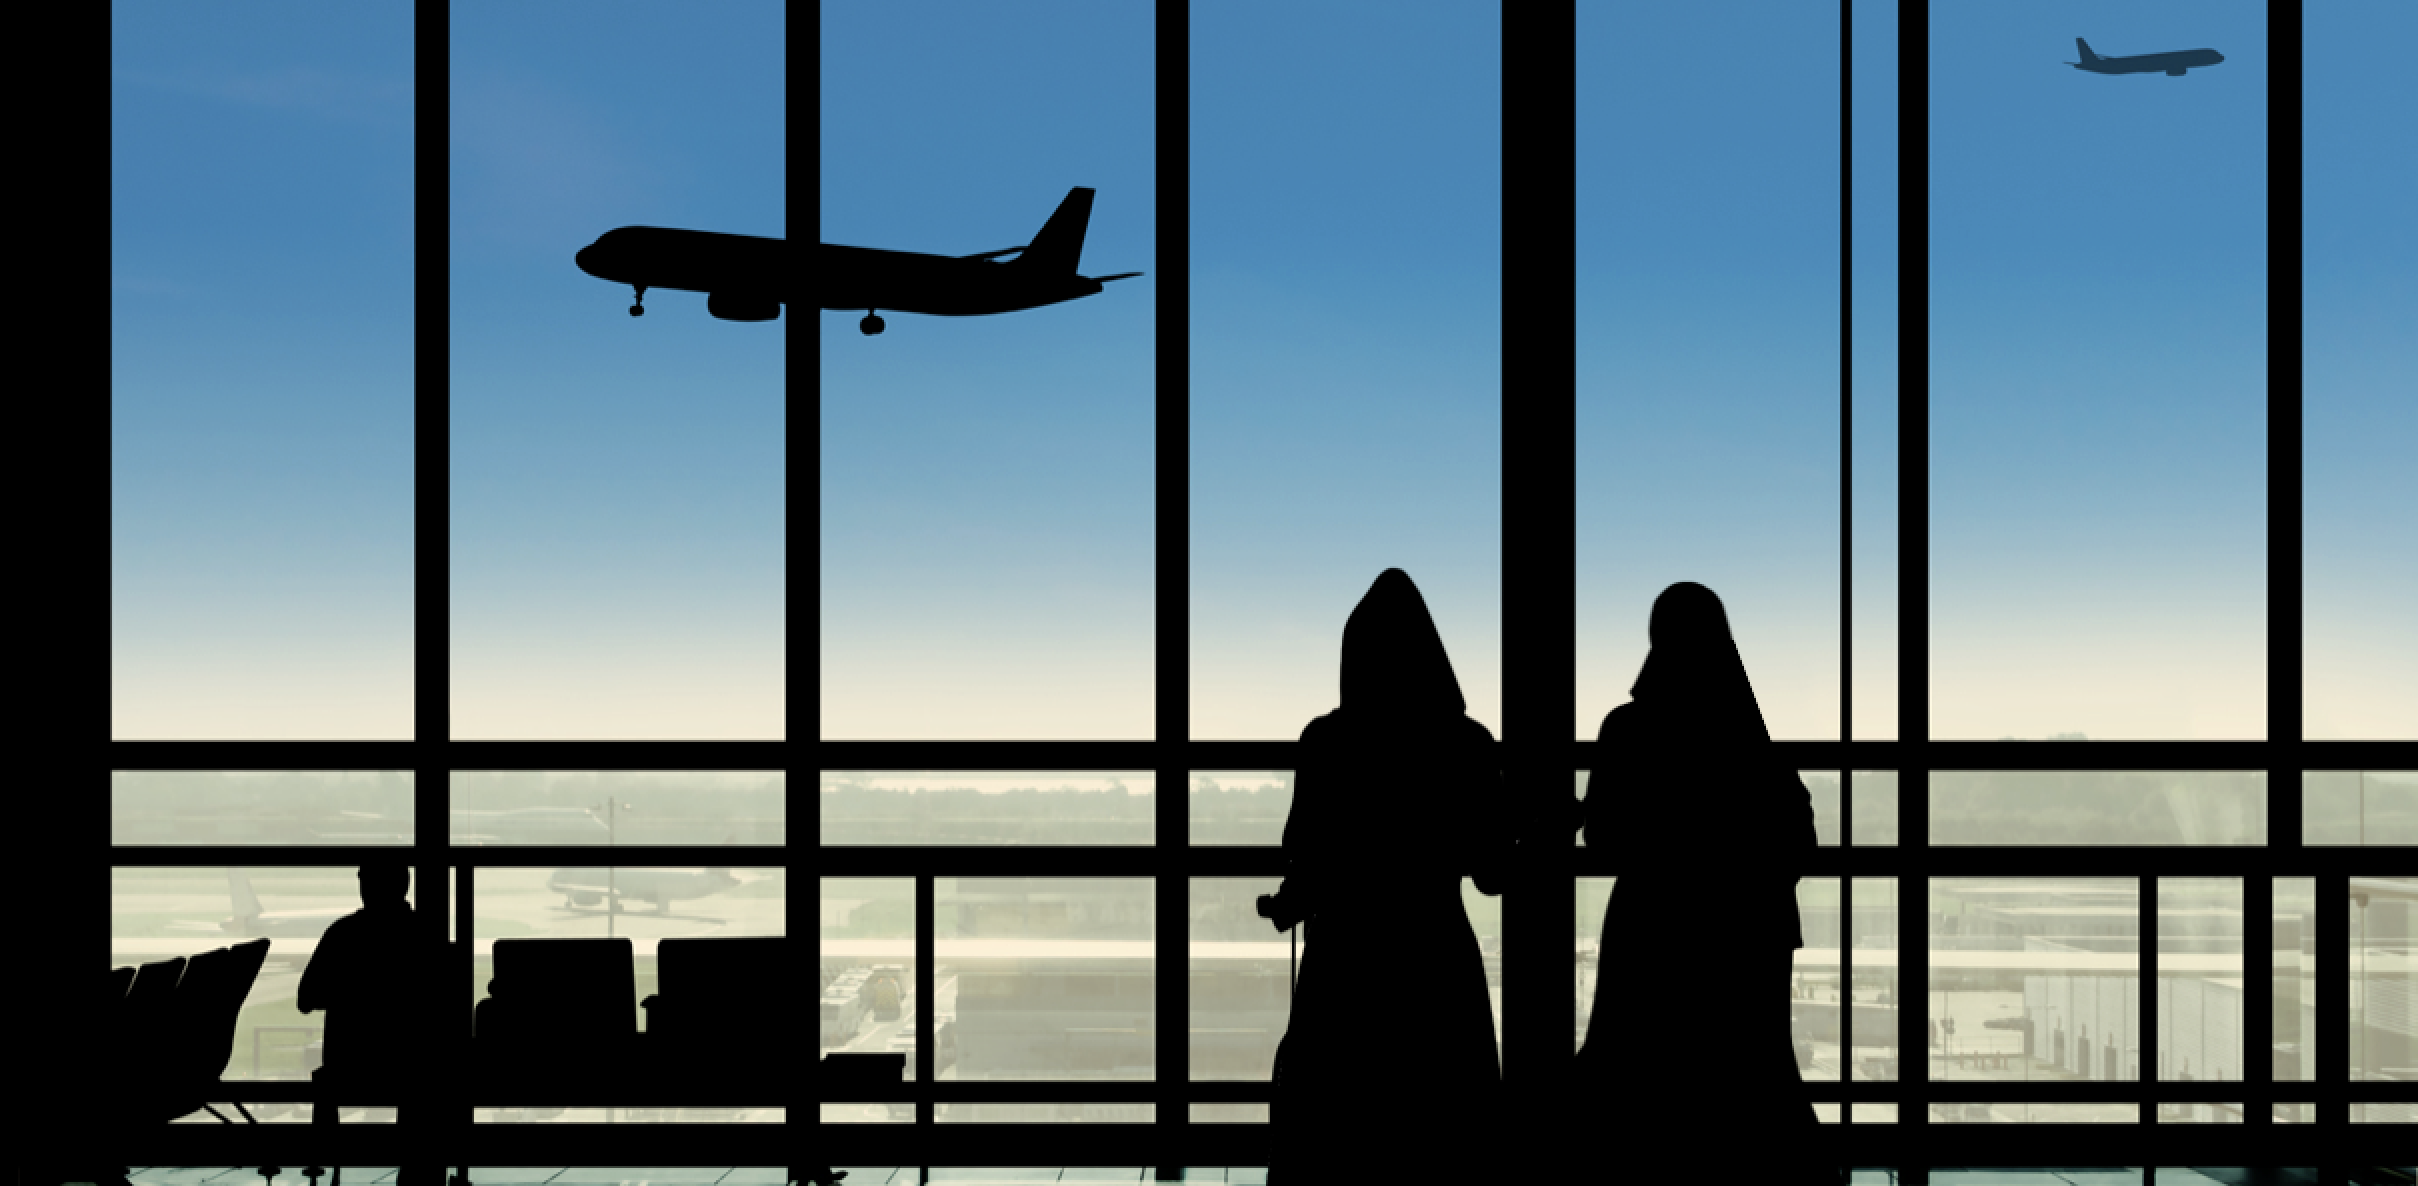 Saudi Women Fleeing Has Become a Nightmare for Saudis, Saudi Women Fleeing Has Become a Nightmare for Saudis